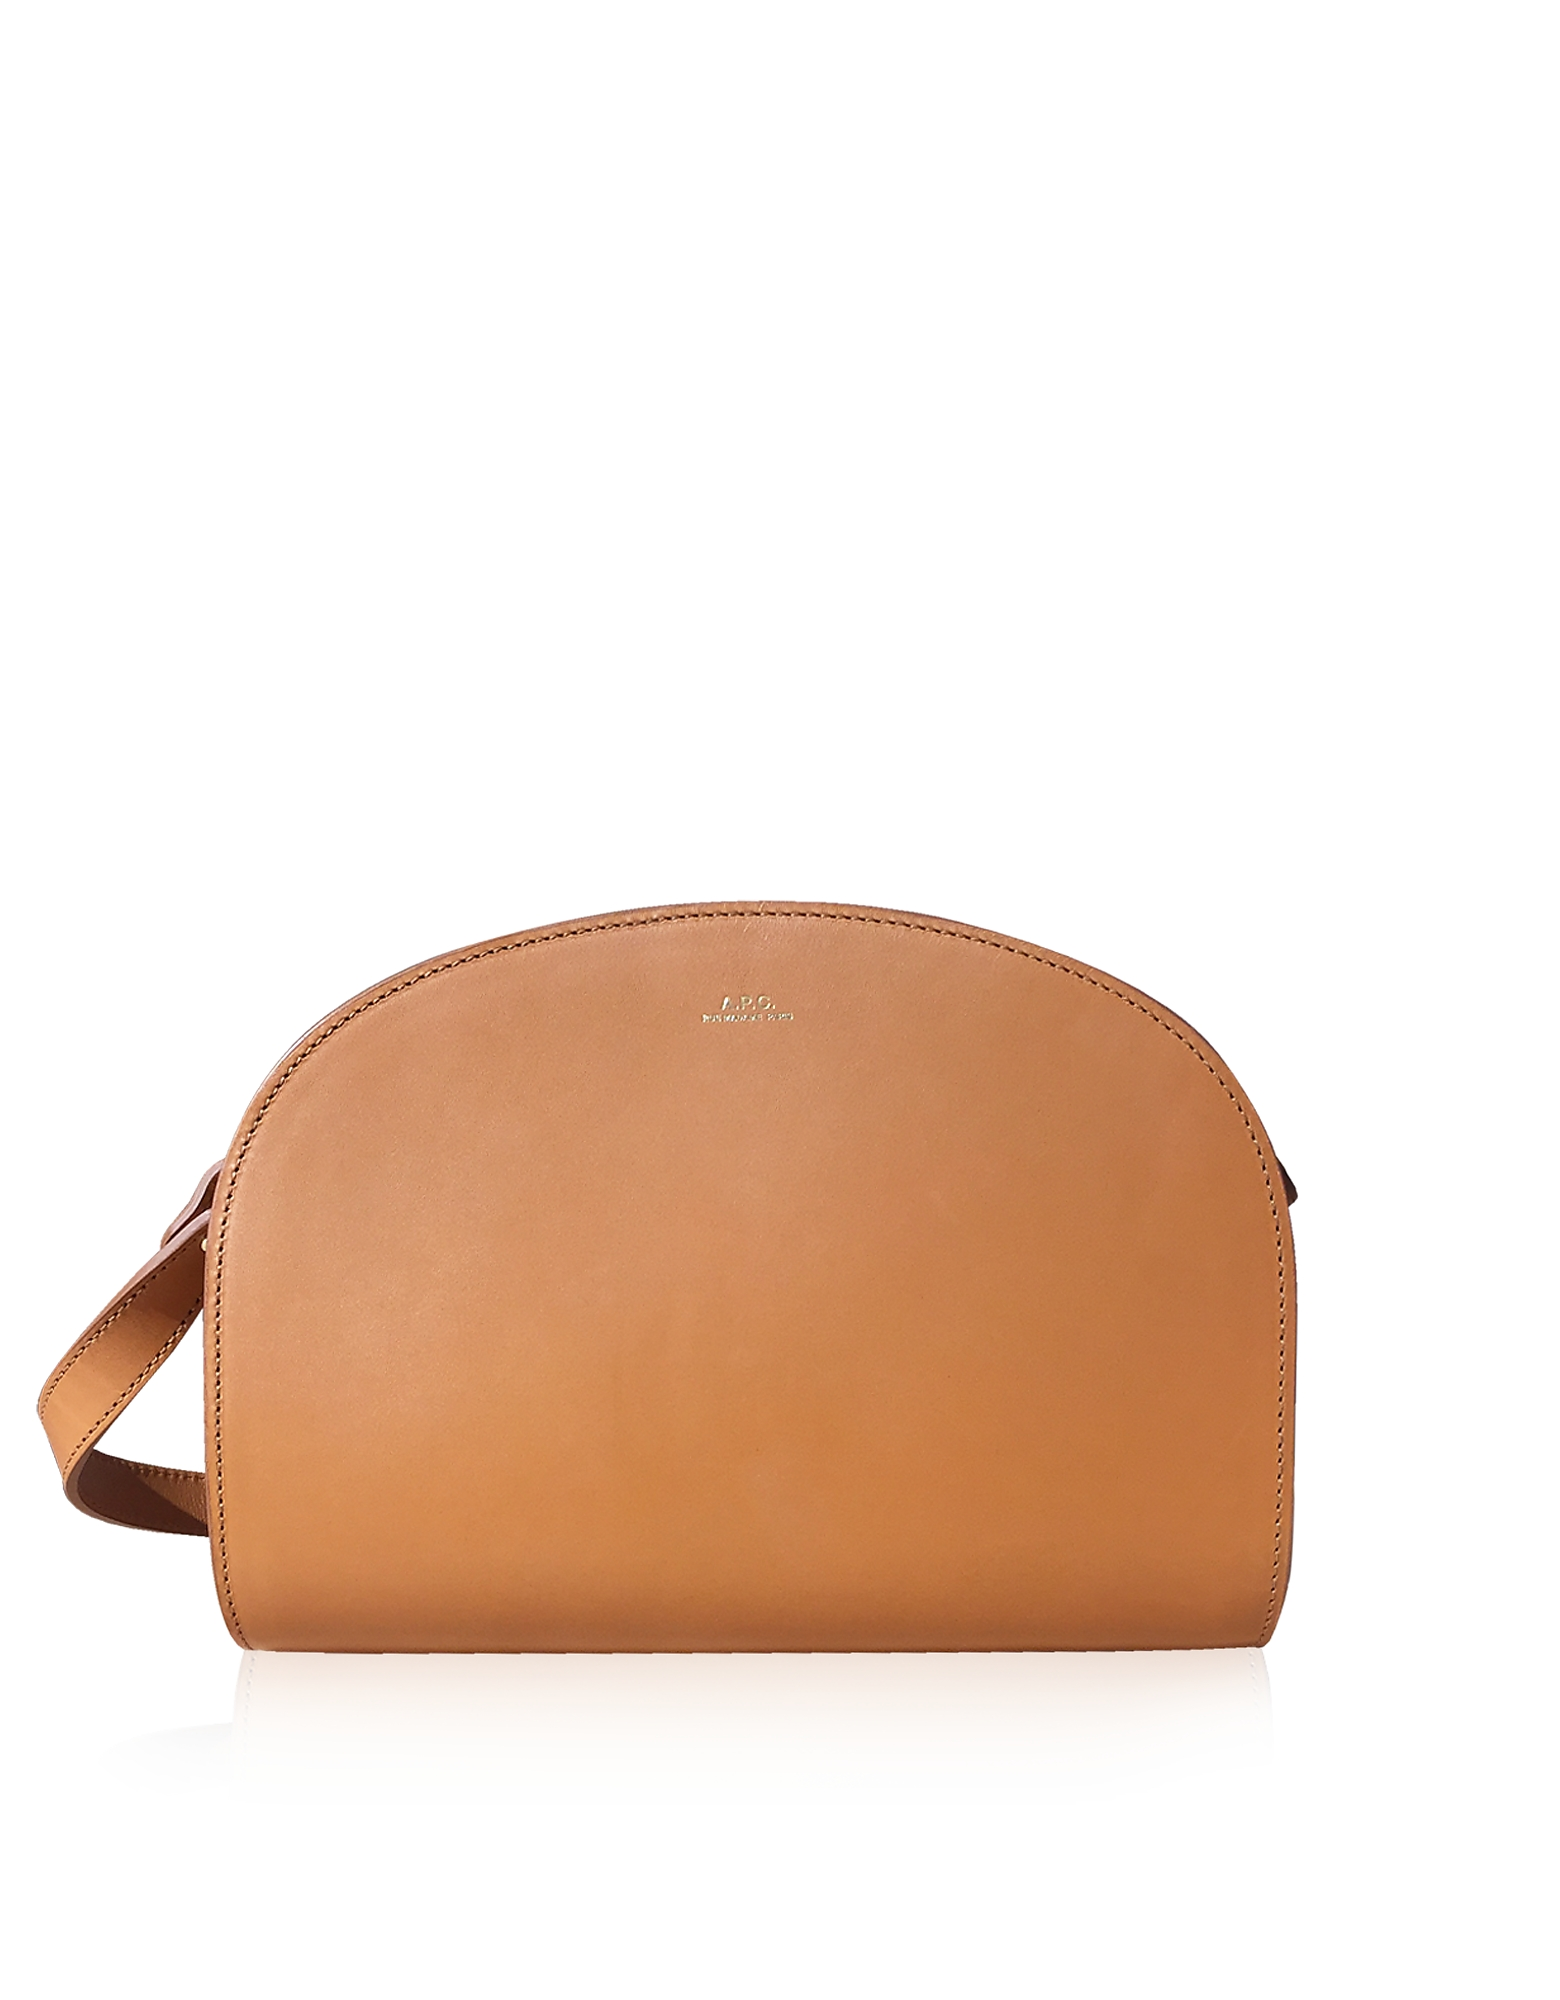 A.P.C. Handbags, Half Moon Smooth Leather Crossbody Bag